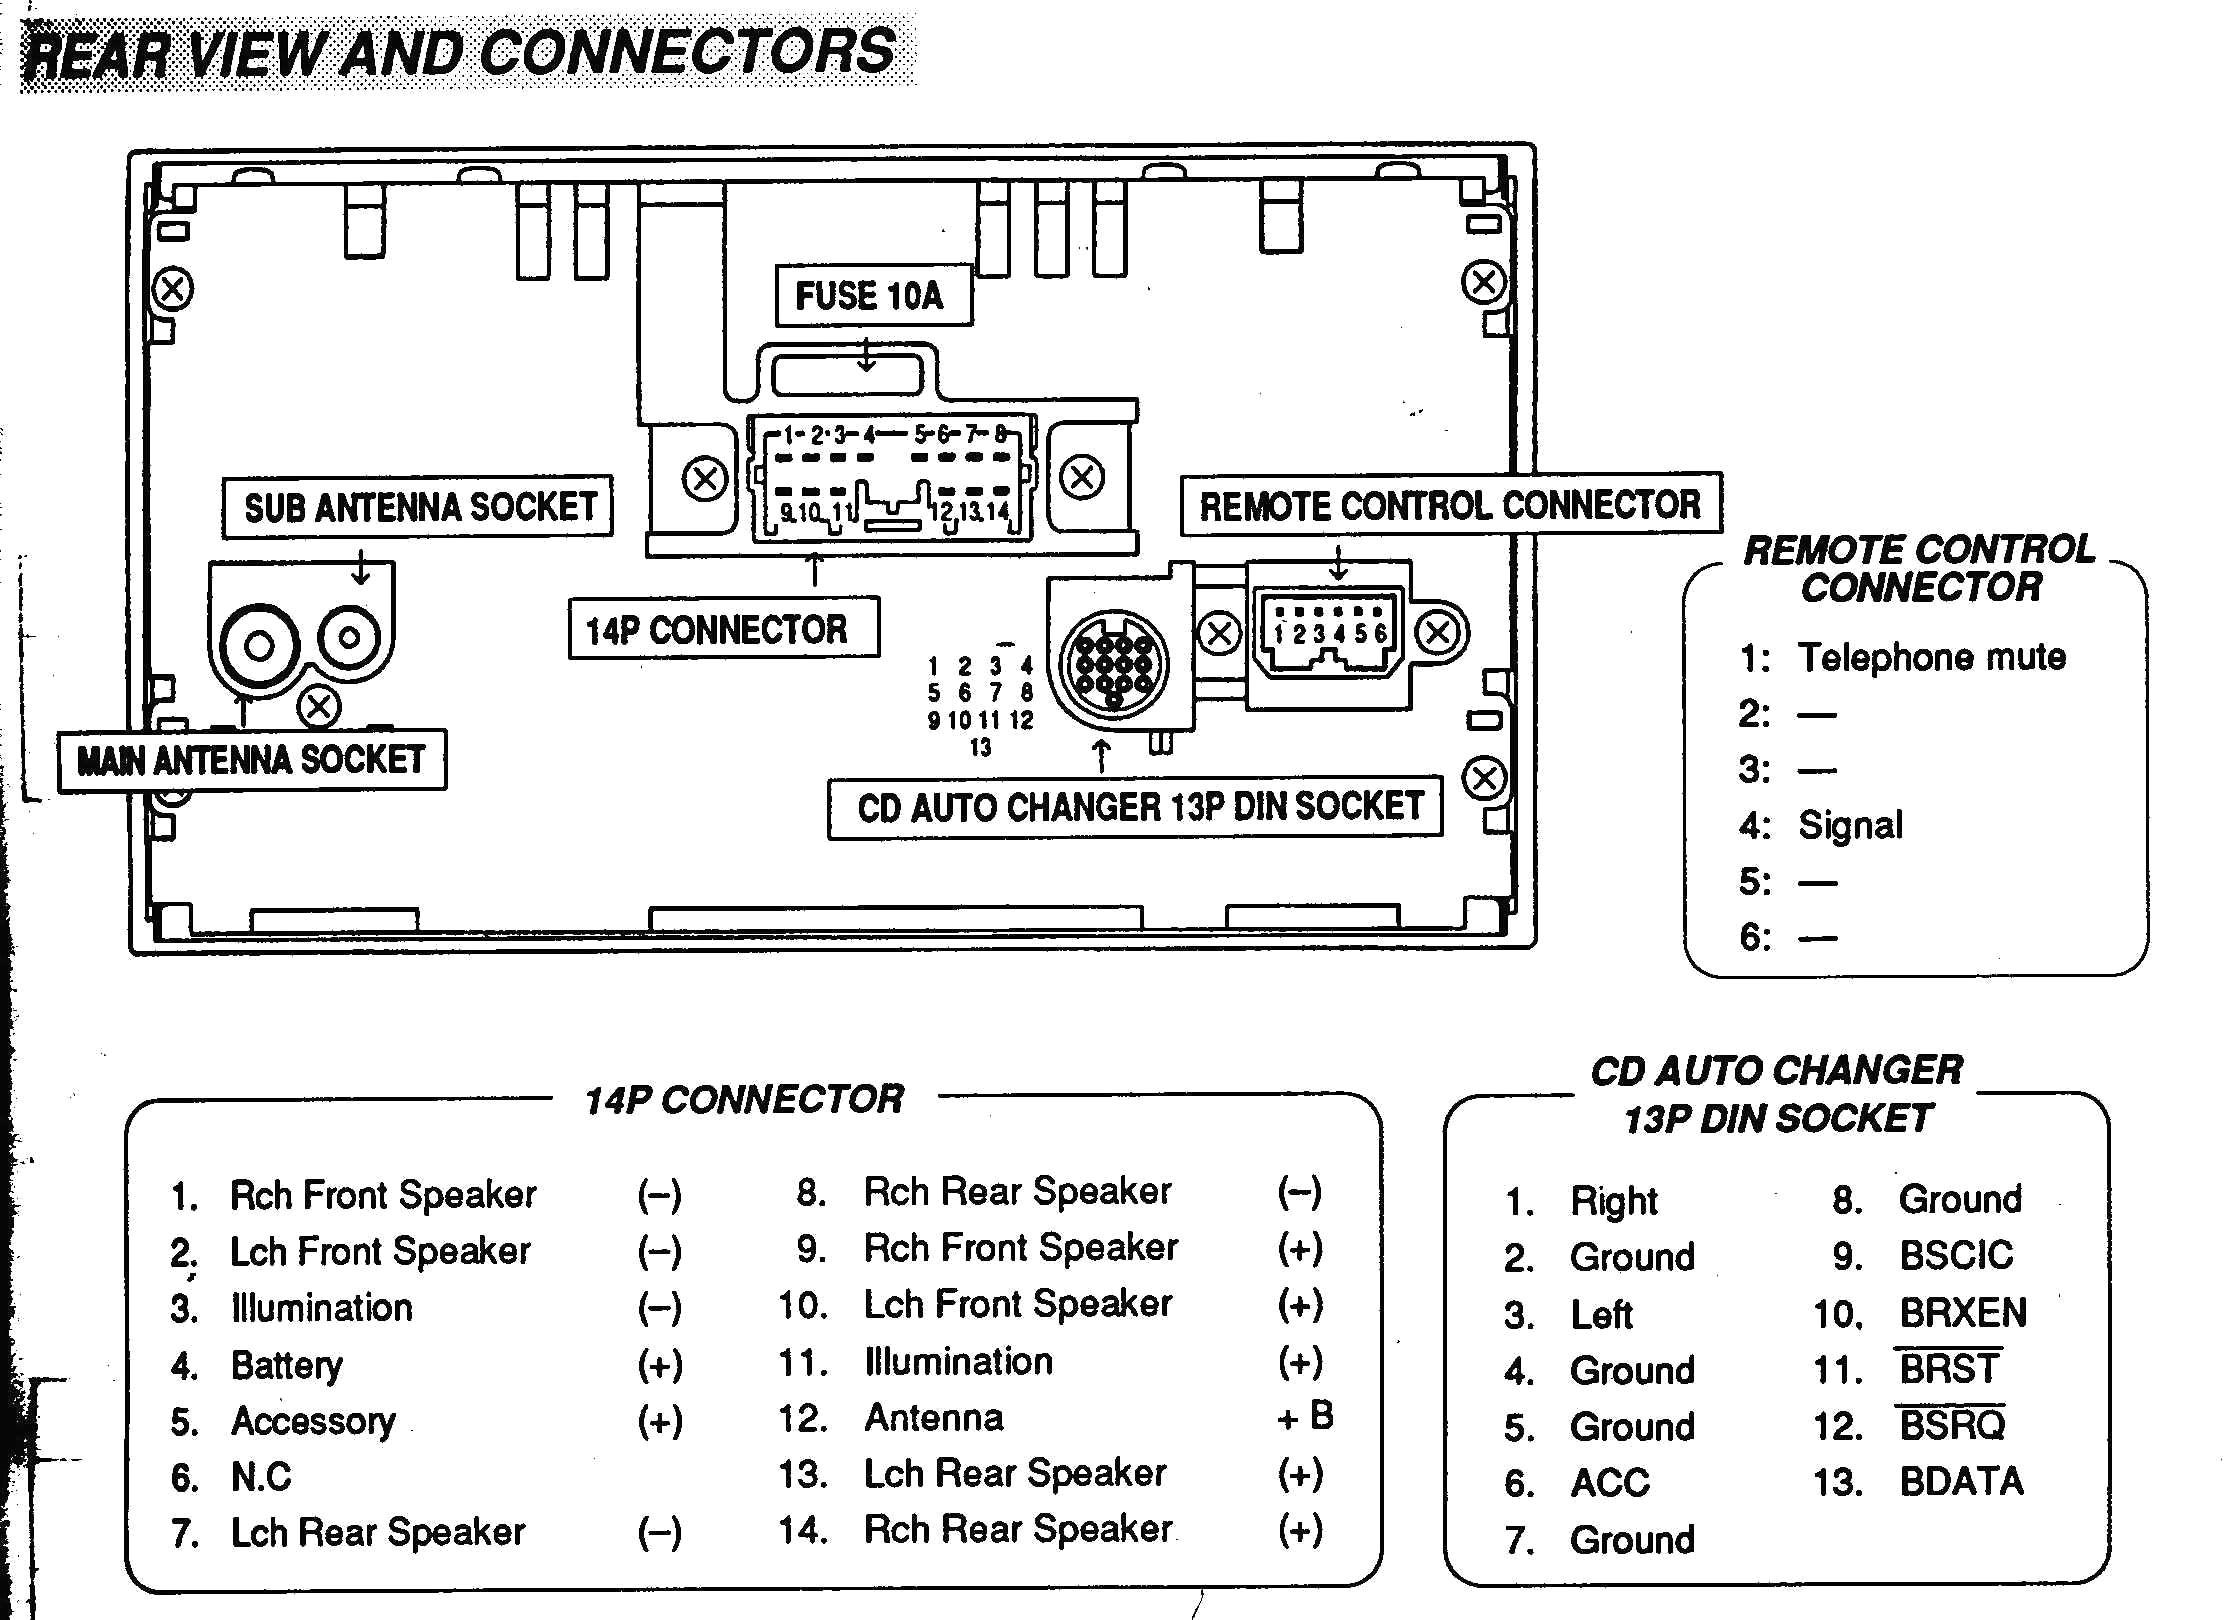 2007 Saturn Wiring Diagrams - Wiring Diagram Server year-match -  year-match.ristoranteitredenari.it | Saturn Ion Stereo Wiring Diagram |  | Ristorante I Tre Denari Manerbio